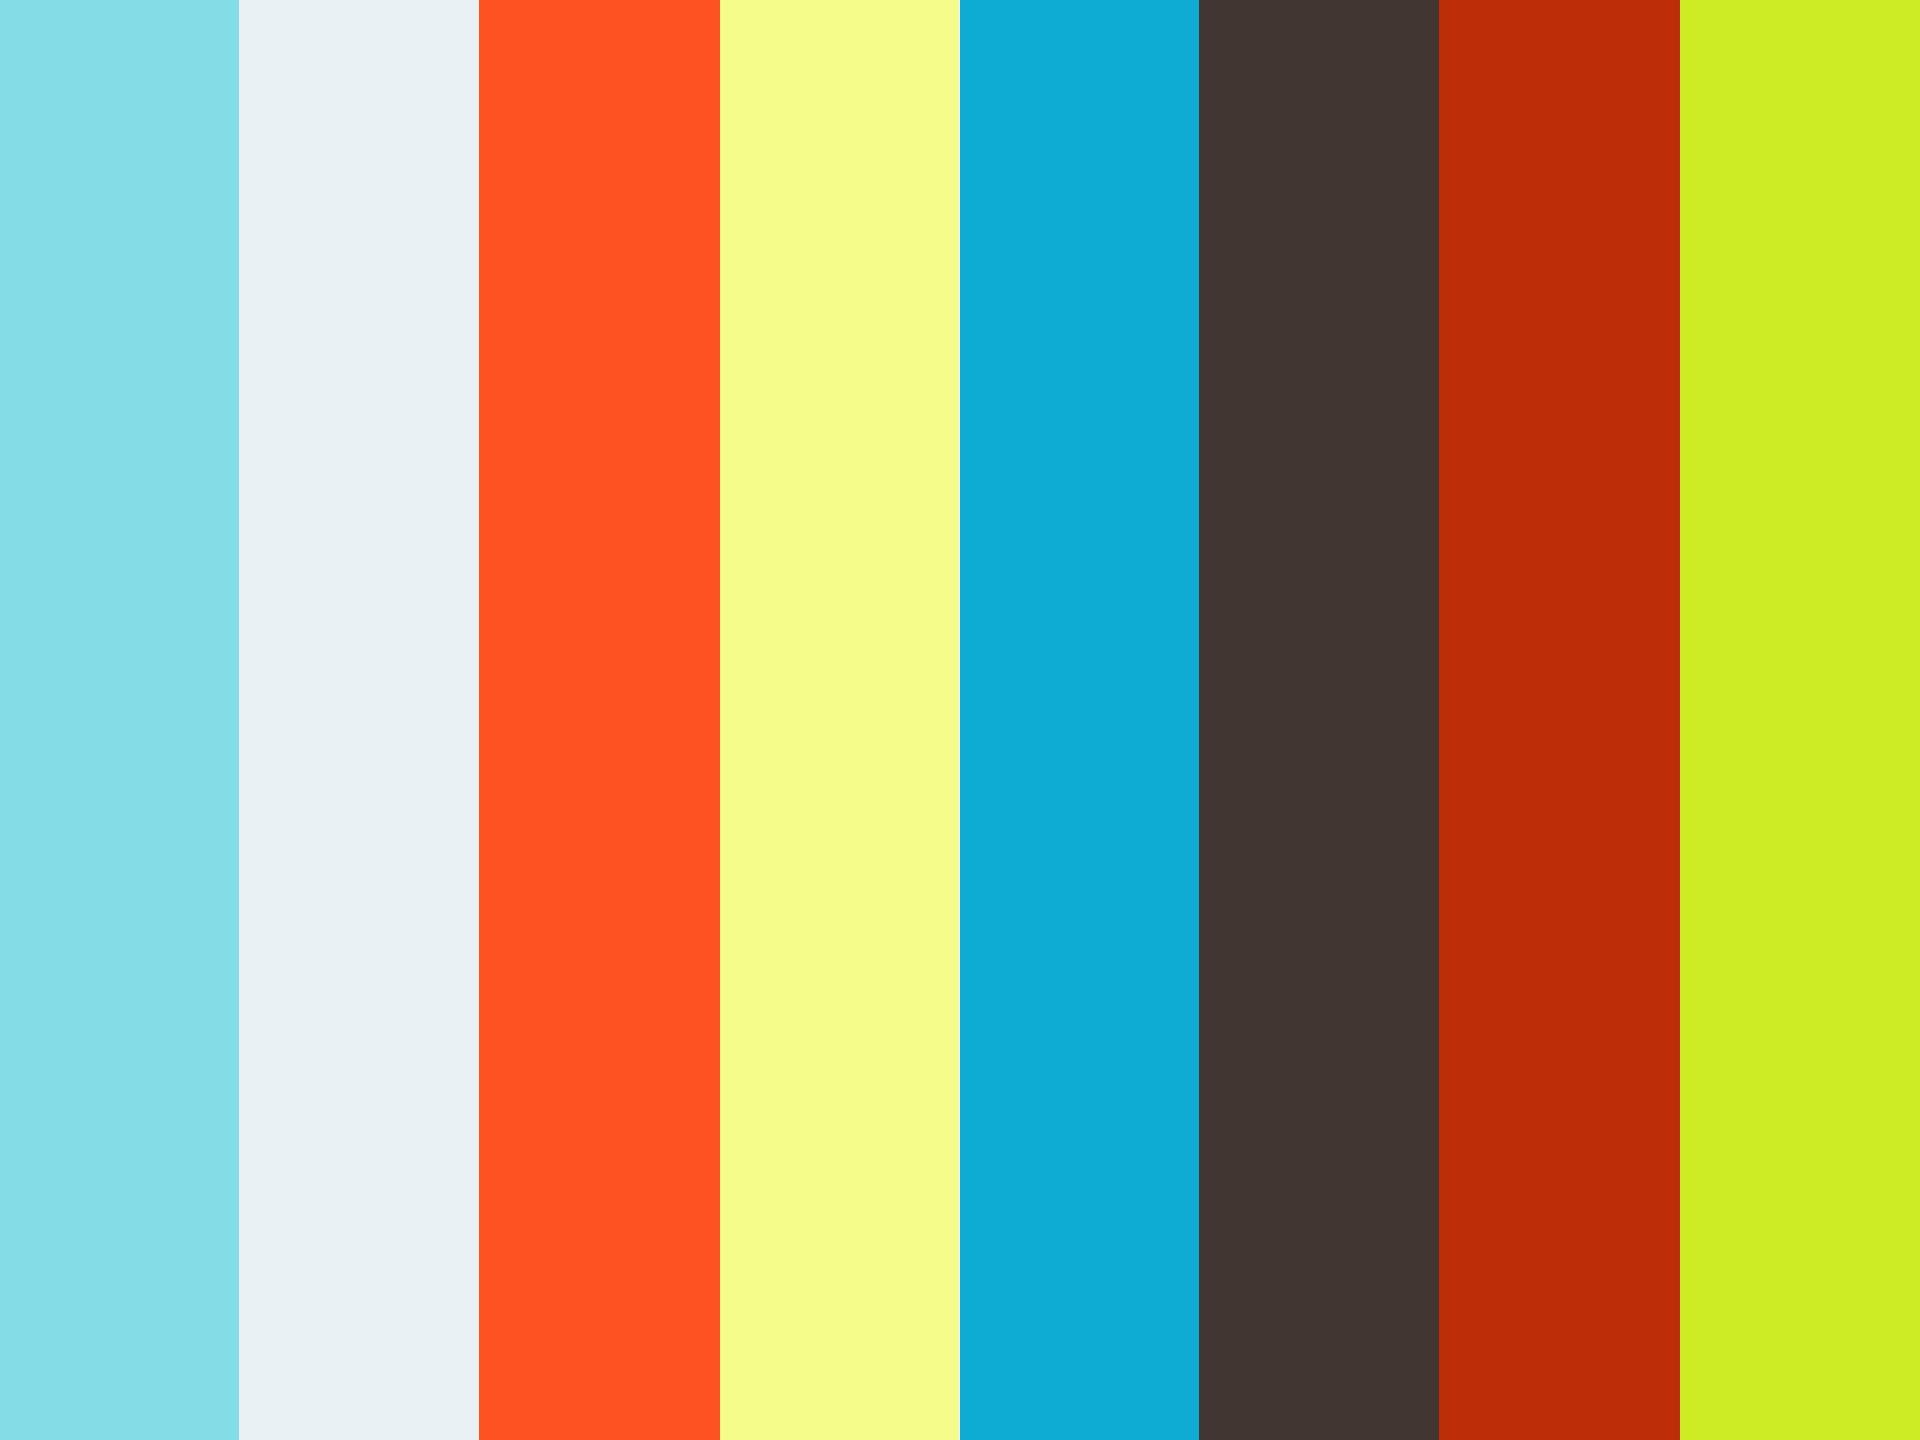 EF Line. 導入セミナー「咬合と機能不全におけるトレーナーの応用」